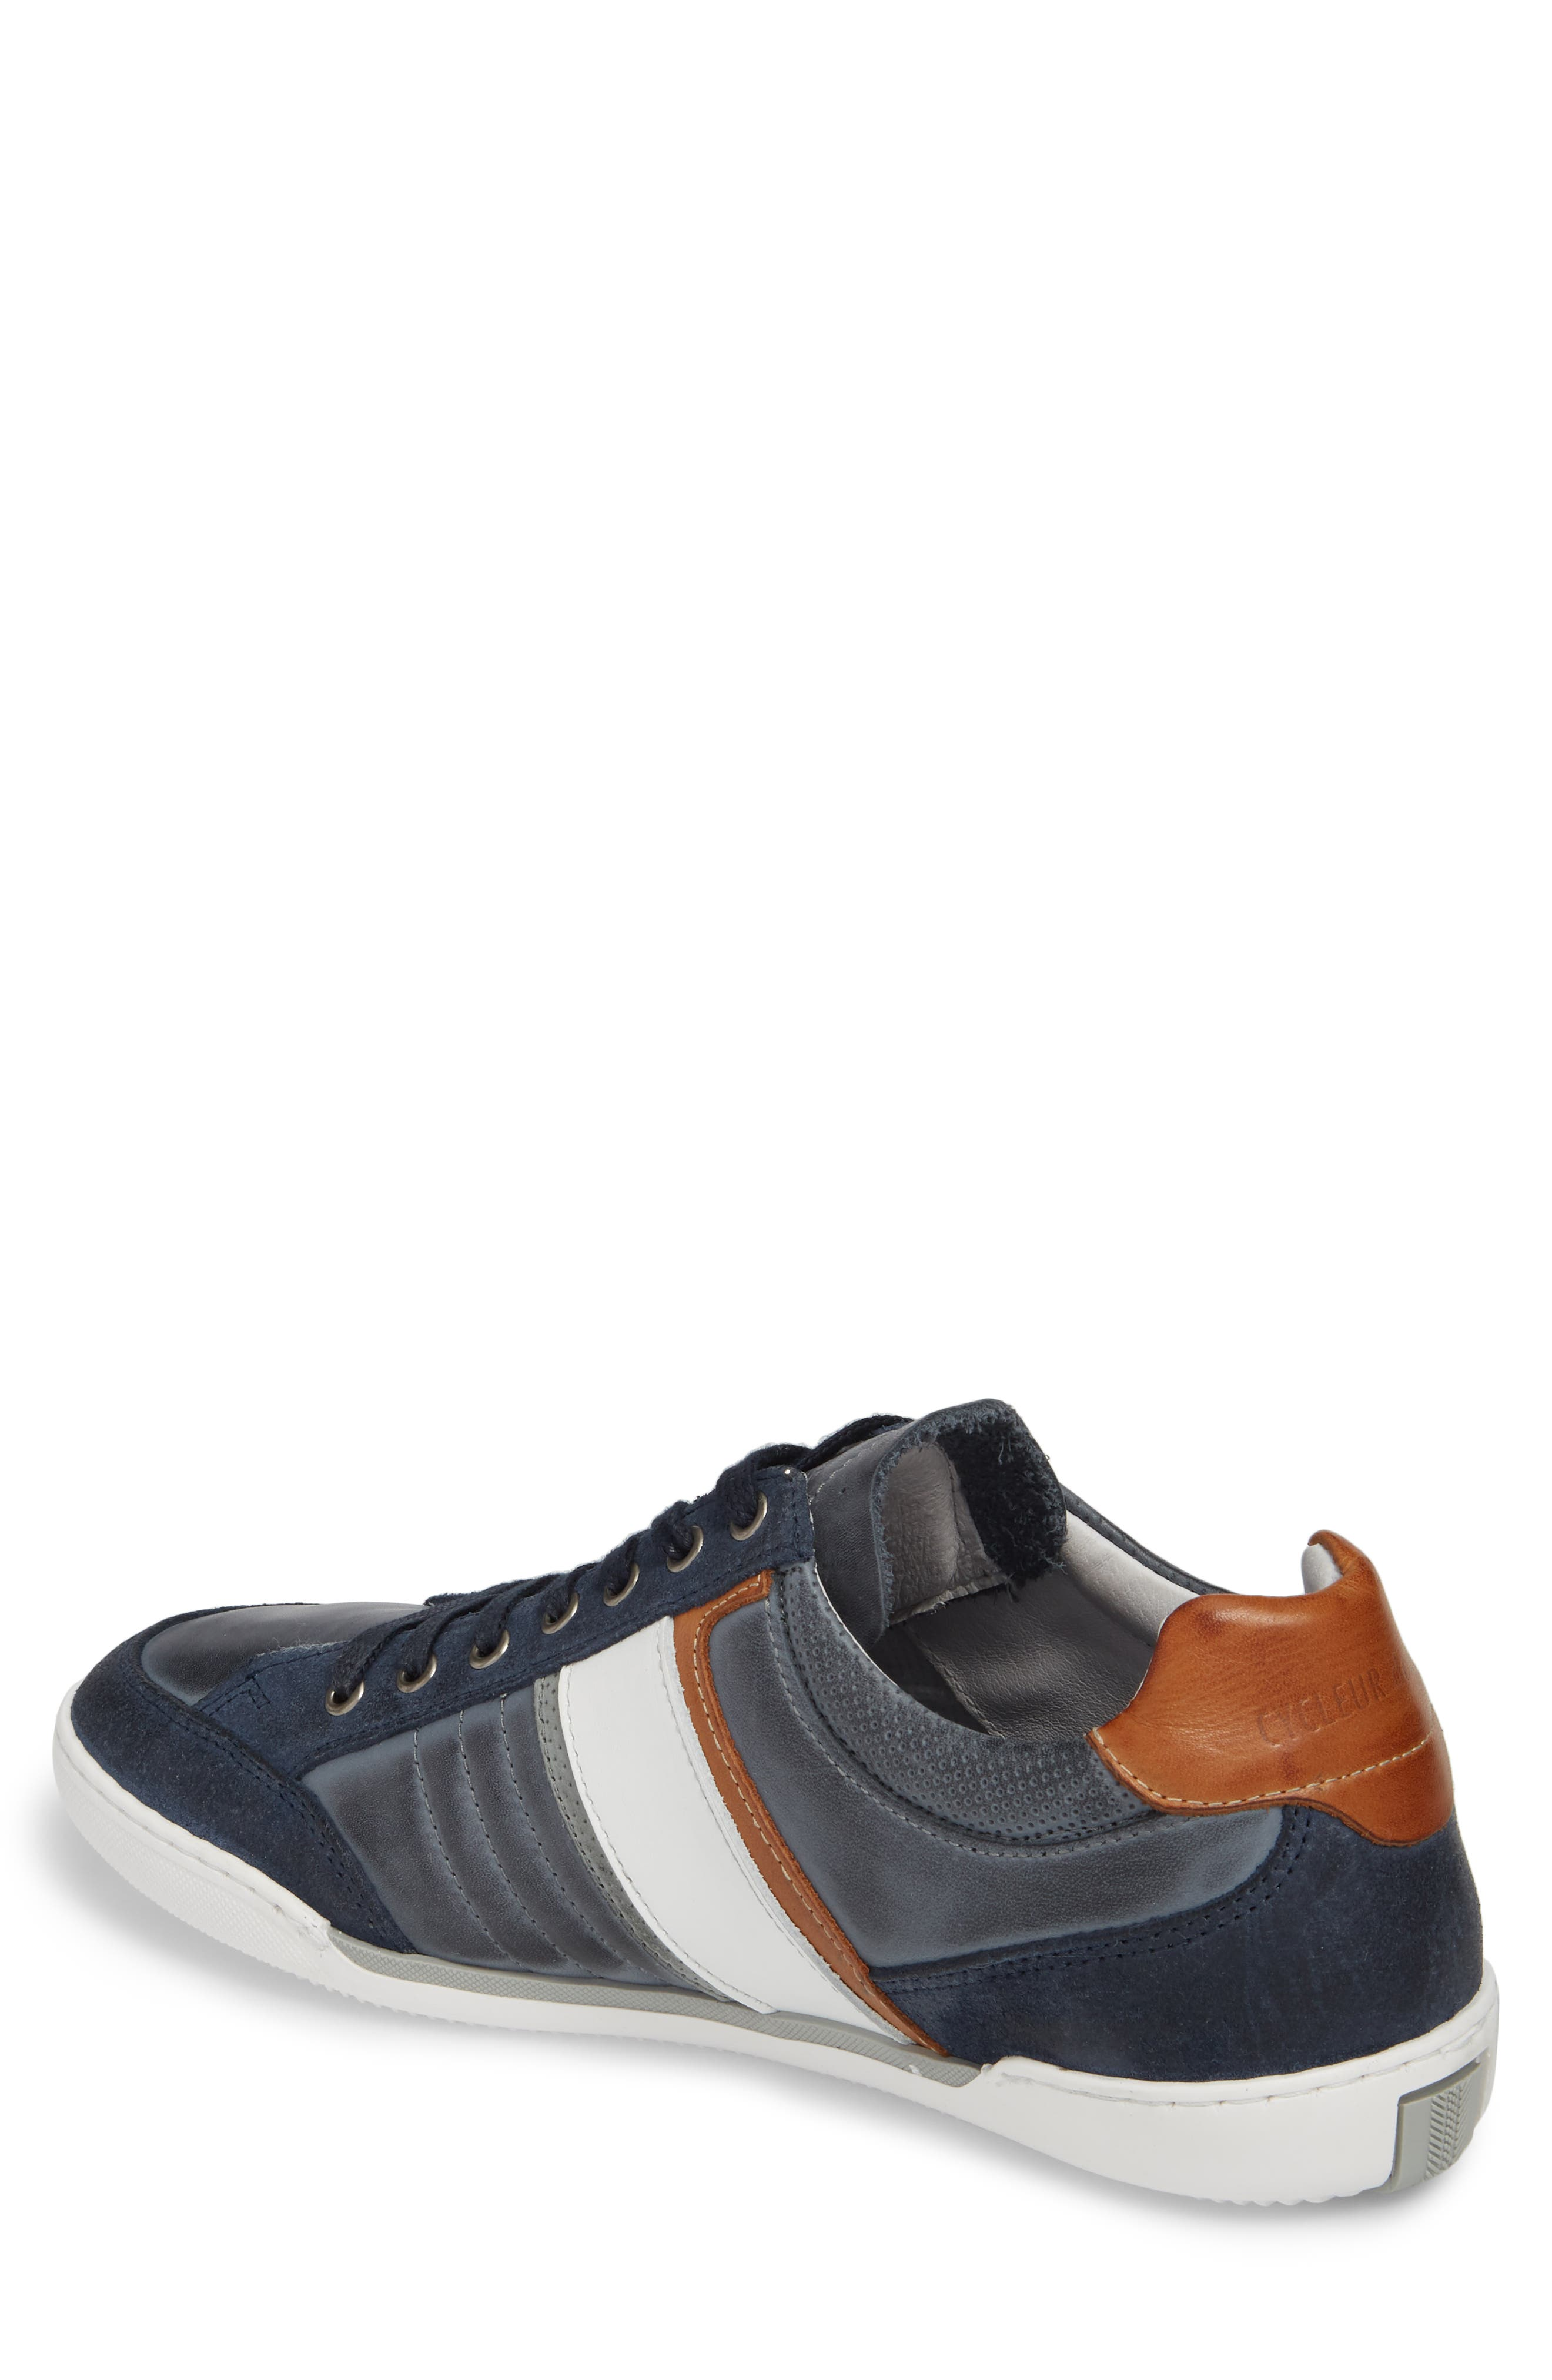 Solo Low Top Sneaker,                             Alternate thumbnail 2, color,                             Denim/ White/ Cognac Leather